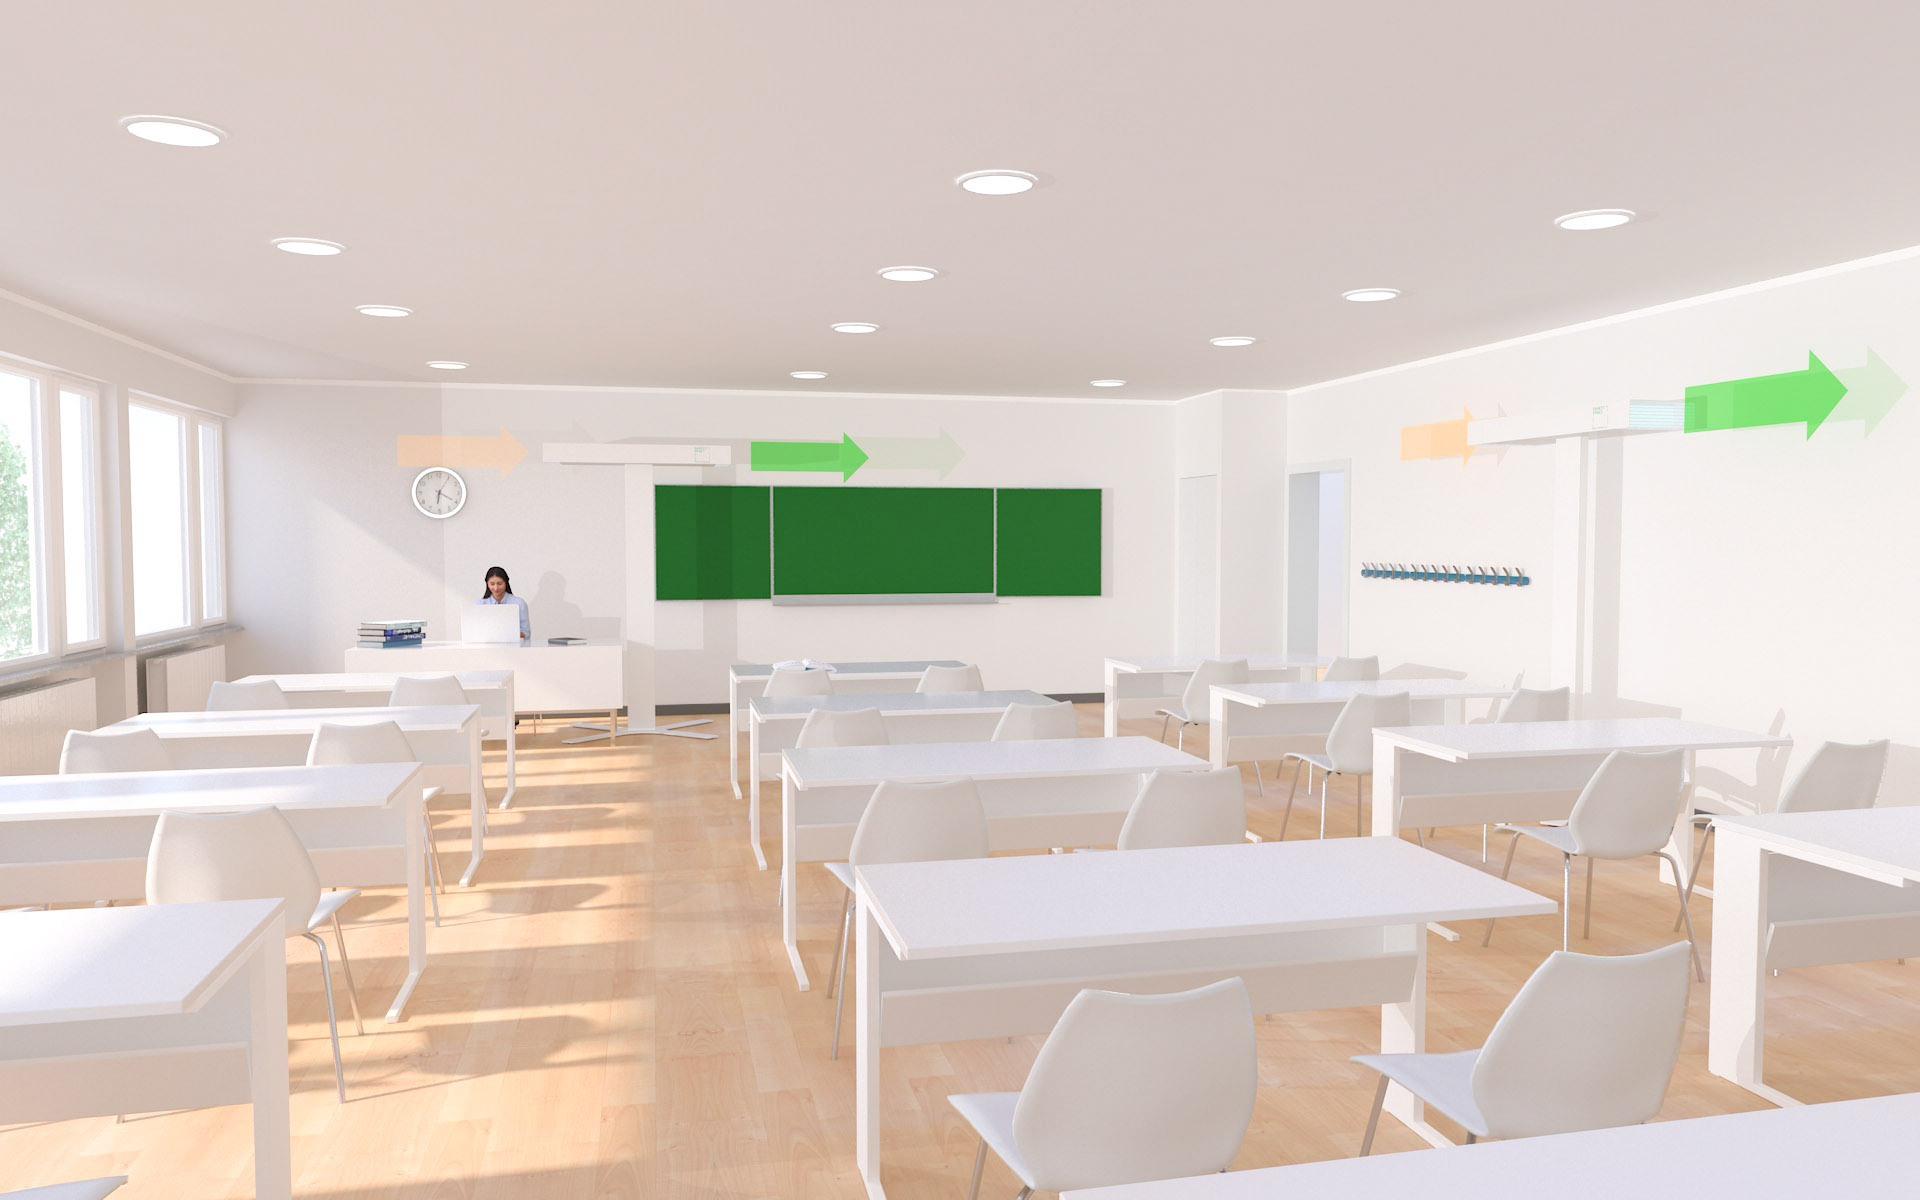 classroom_uv7b